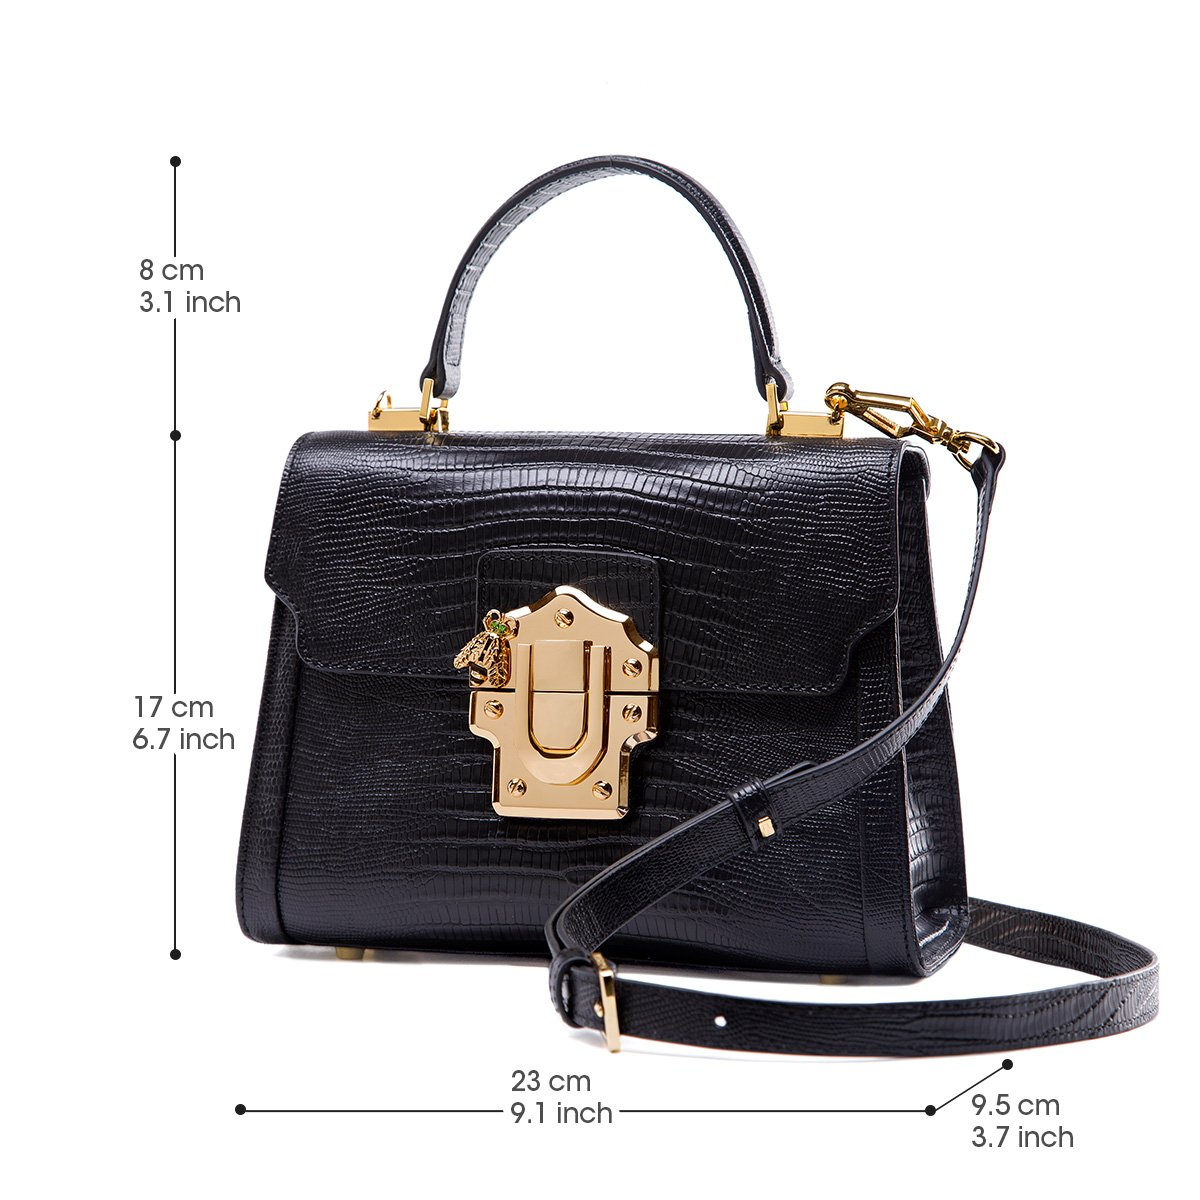 c9812f606e30 Amazon.com  LA FESTIN Ladies Crossbody Handbags Lizard Pattern Leather  Shoulder Tote Purse Mini  Shoes